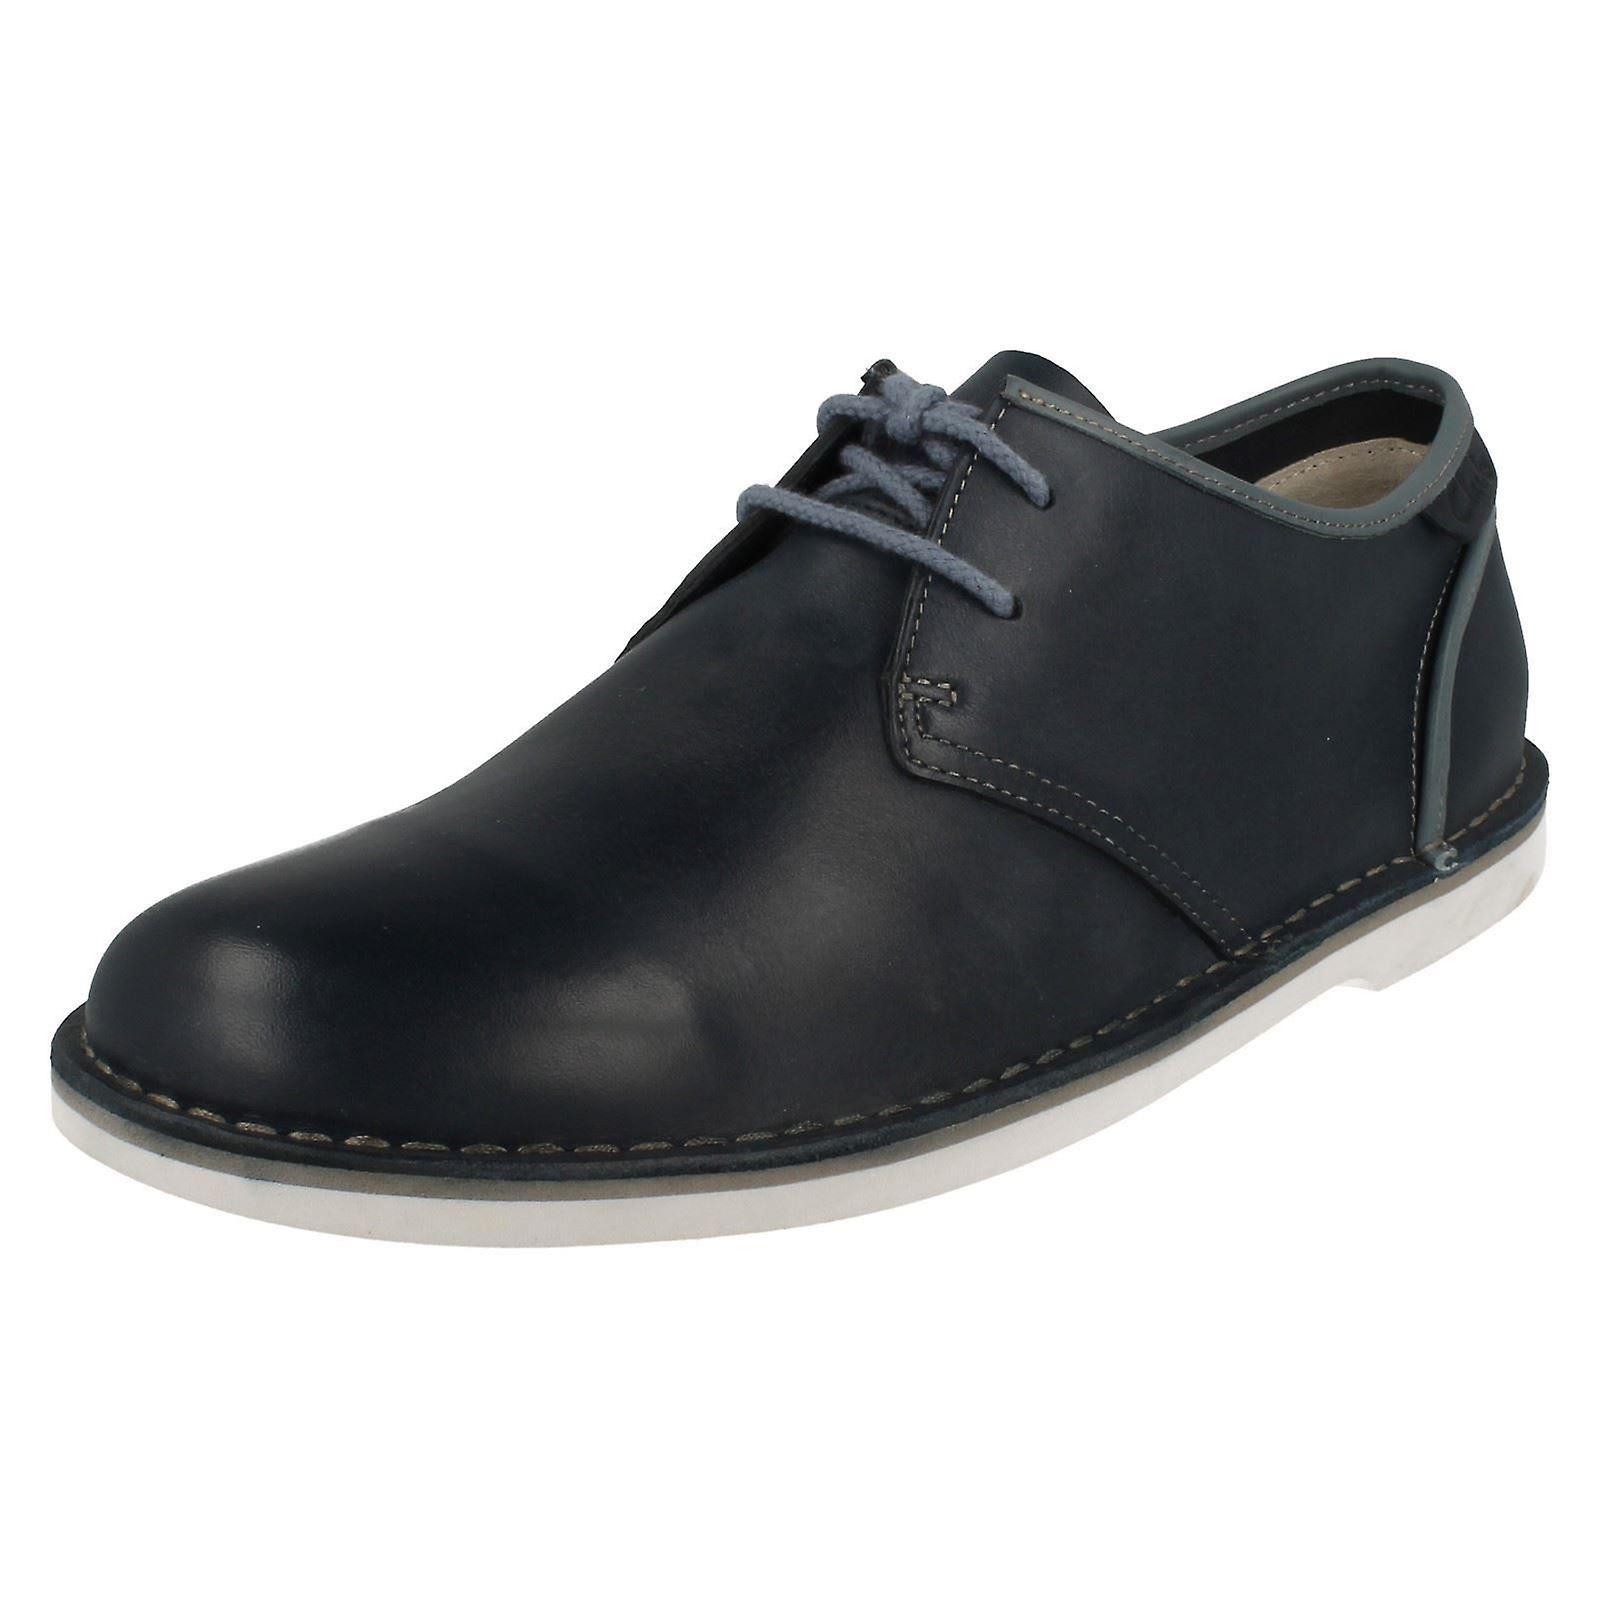 Herren Clarks Casual Schnürschuh Schuhe Marden Grove